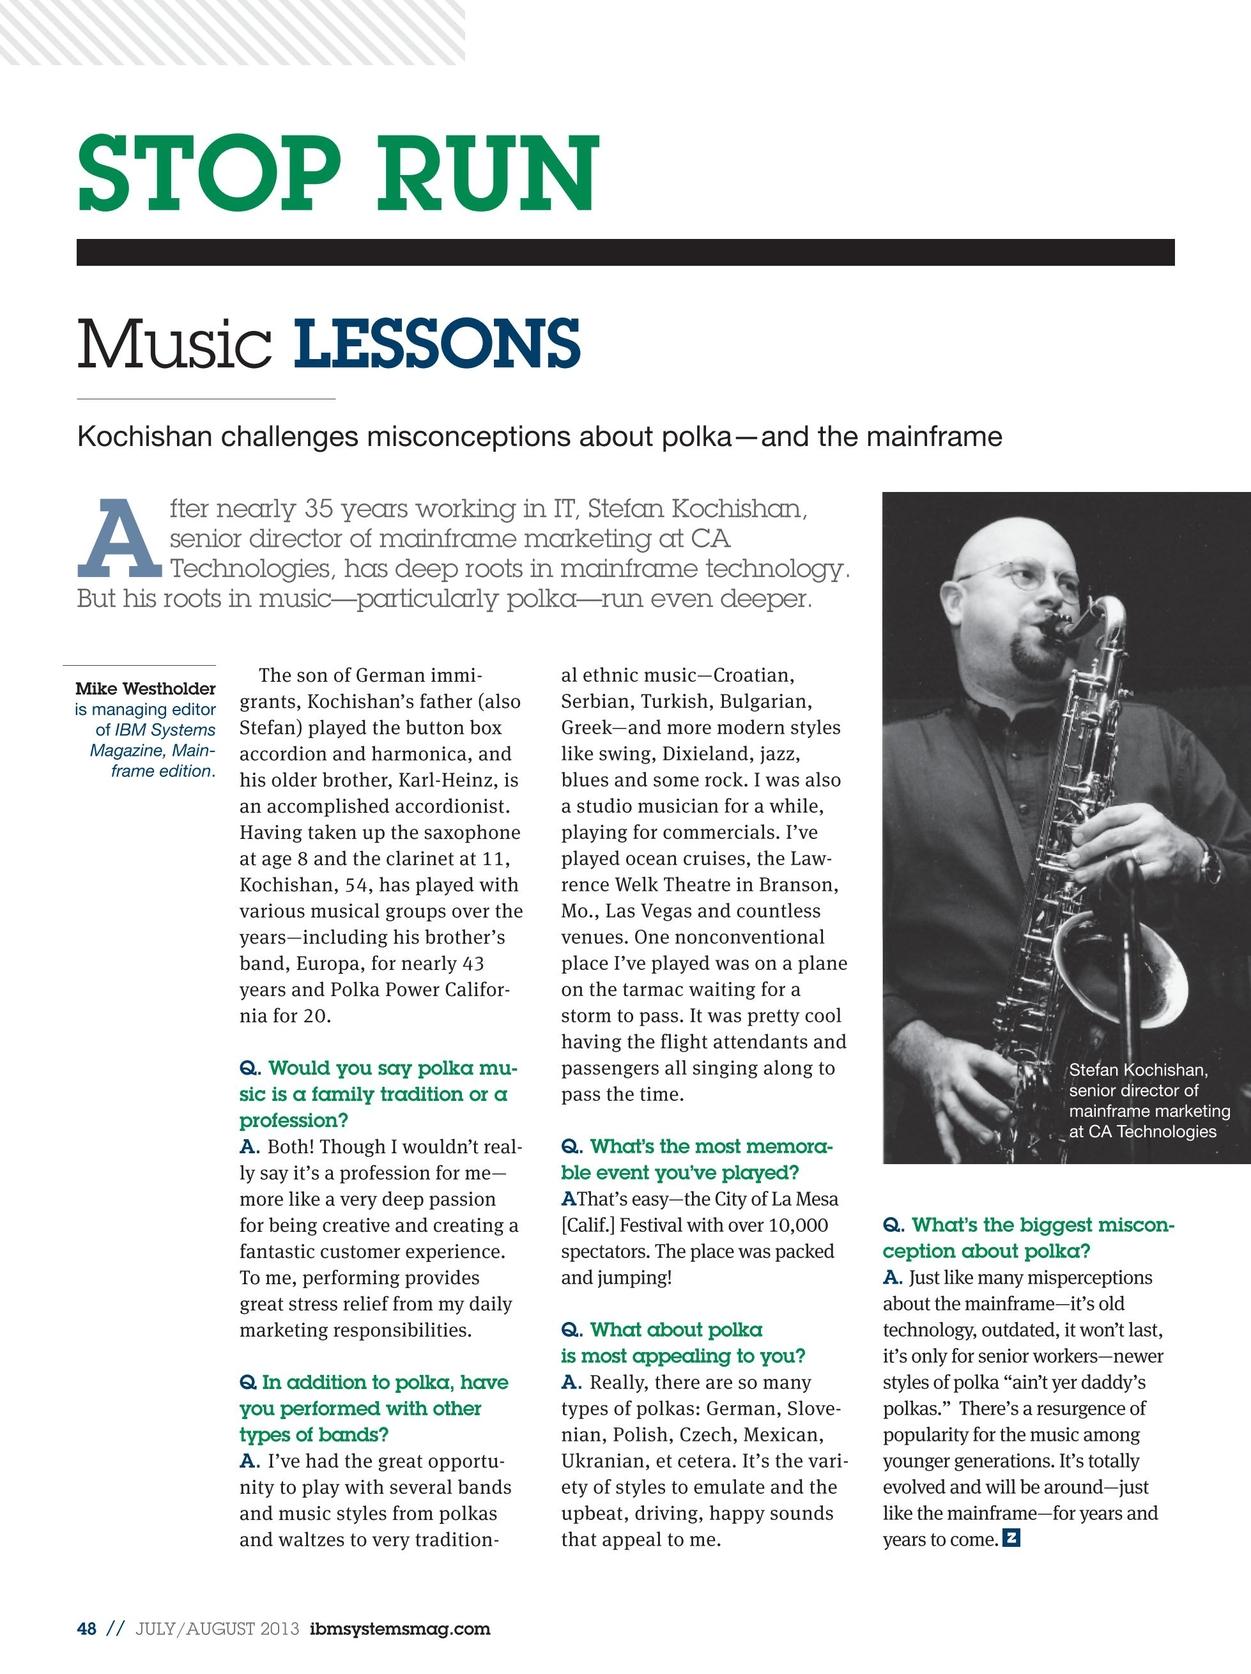 IBM Systems Magazine, Mainframe - July/August 2013